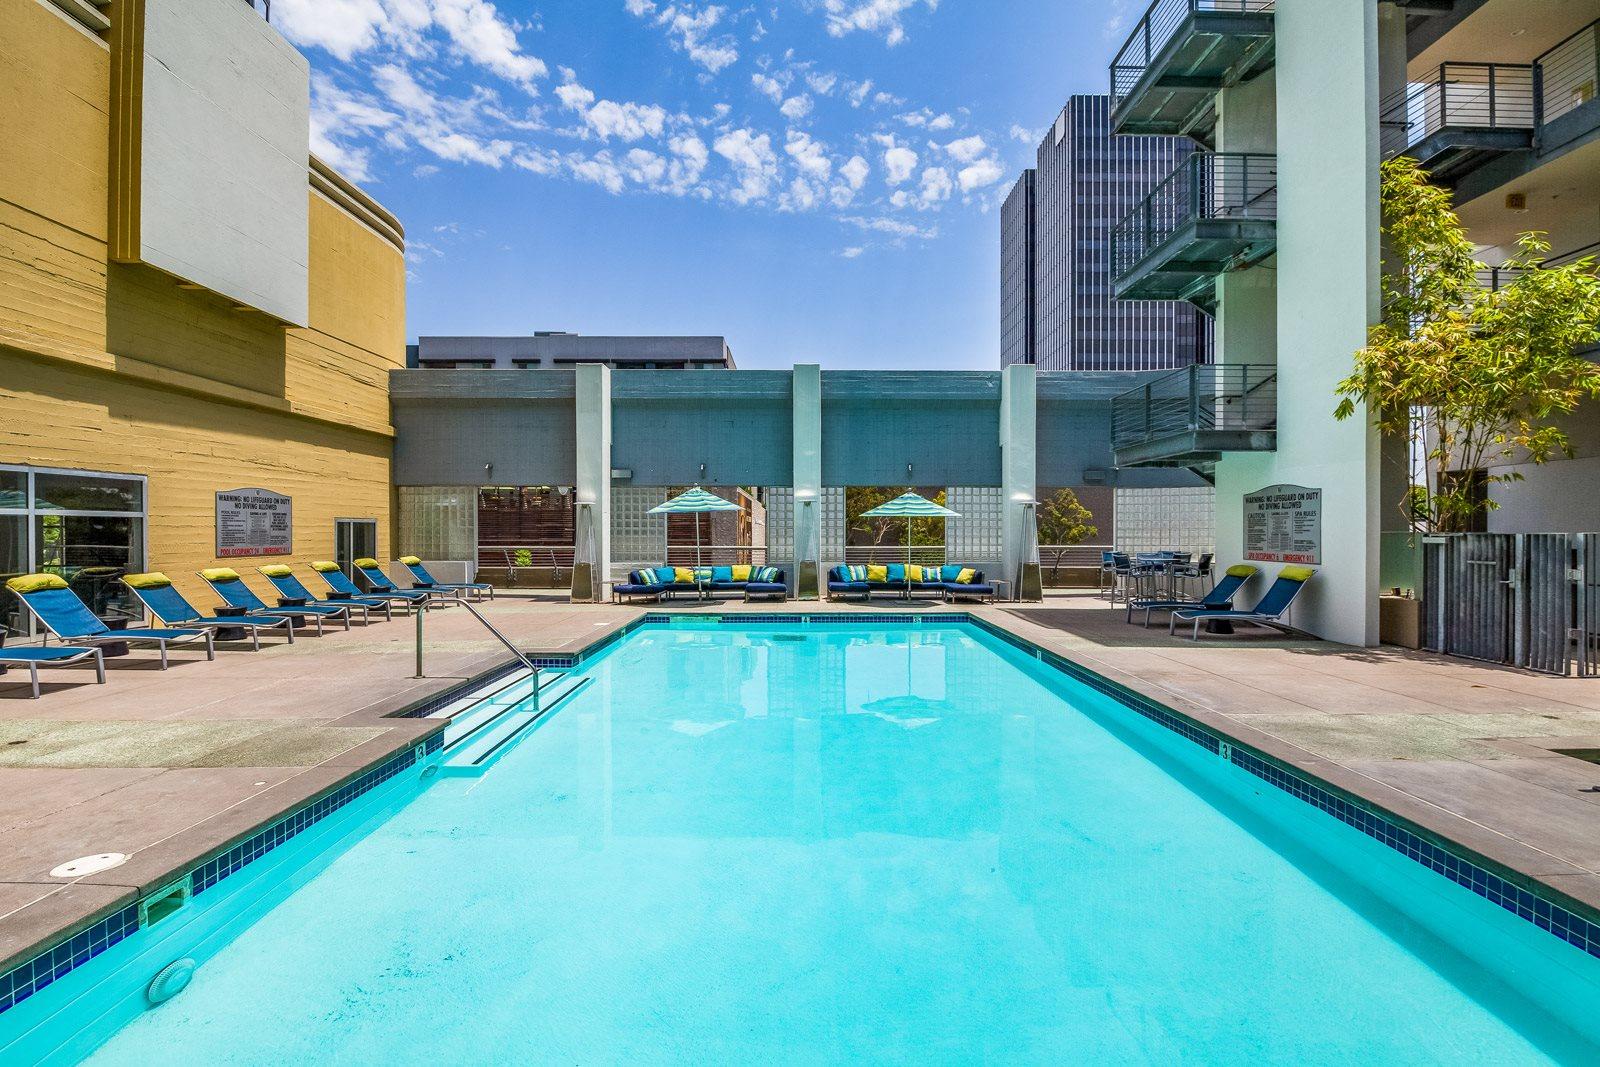 Pool and Sundeck at Sunset and Vine, 1555 Vine Street, Los Angeles